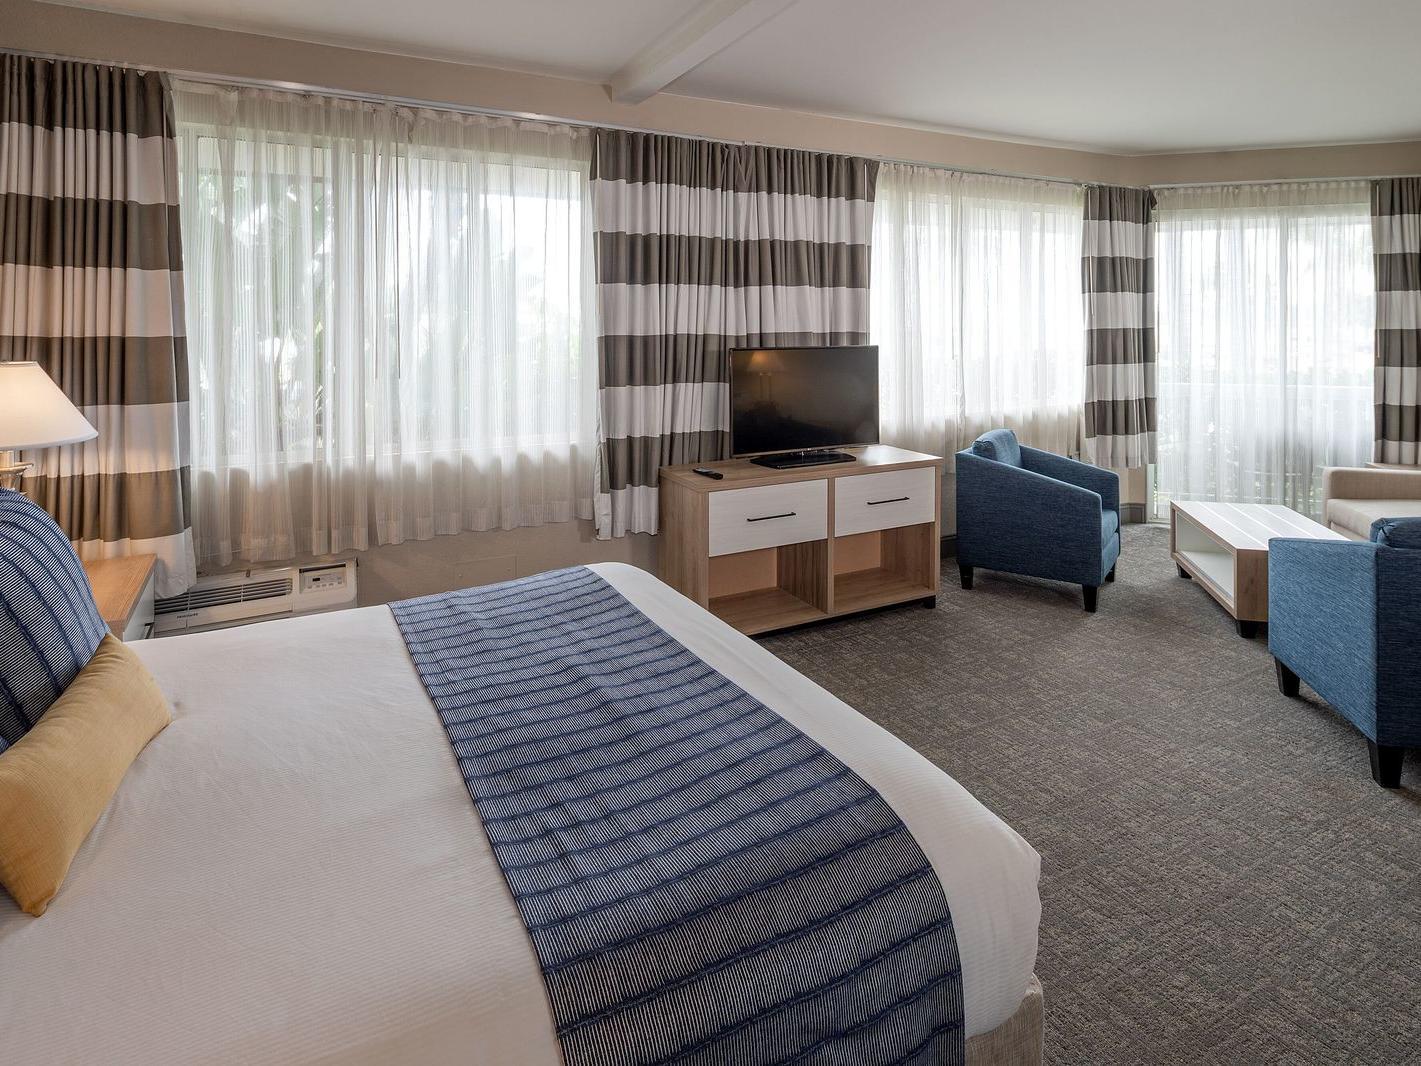 Partial View Executive Suite bedroom area at Bay Club Hotel